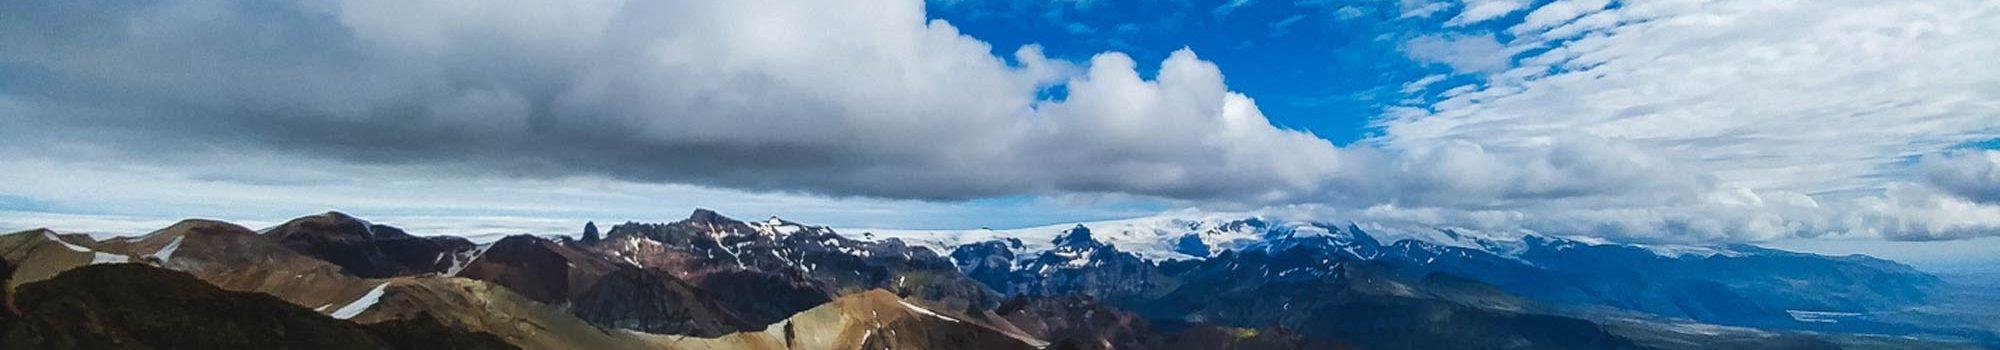 Vatnajokull-Nationalpark-Backpacking-Iceland (47)